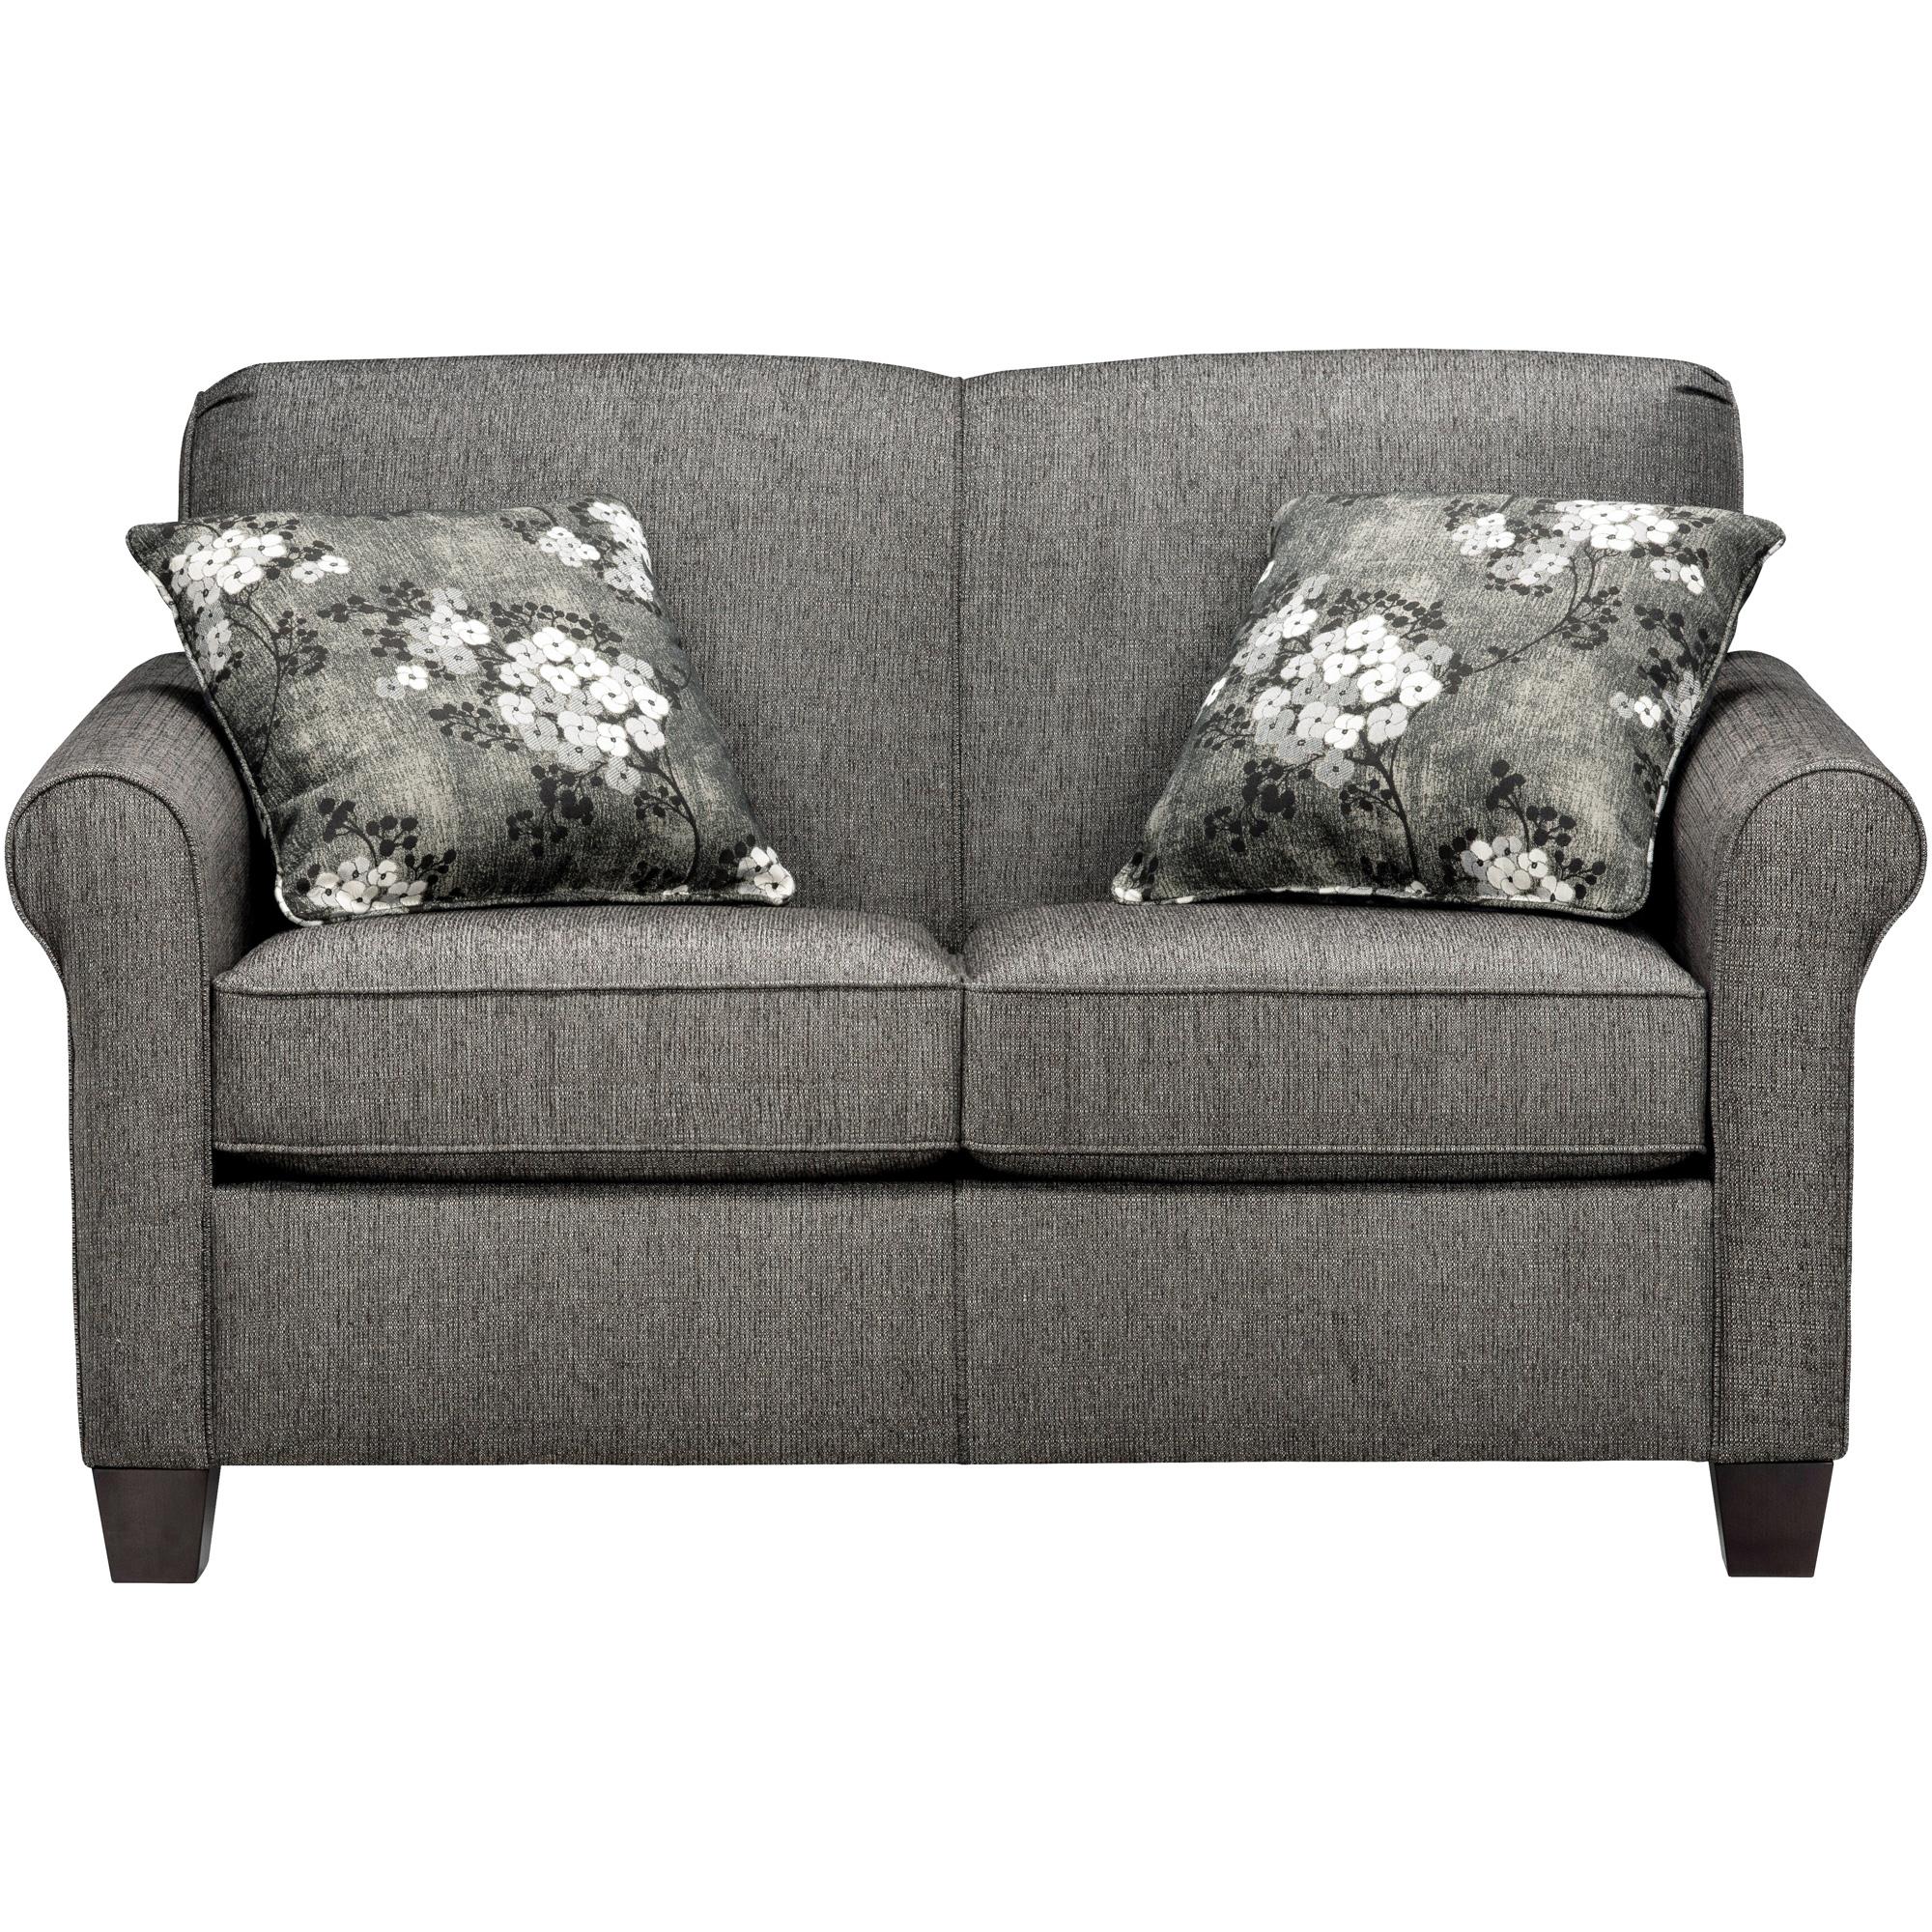 Dimensions By England   York Granite Twin Air Sleeper Sofa